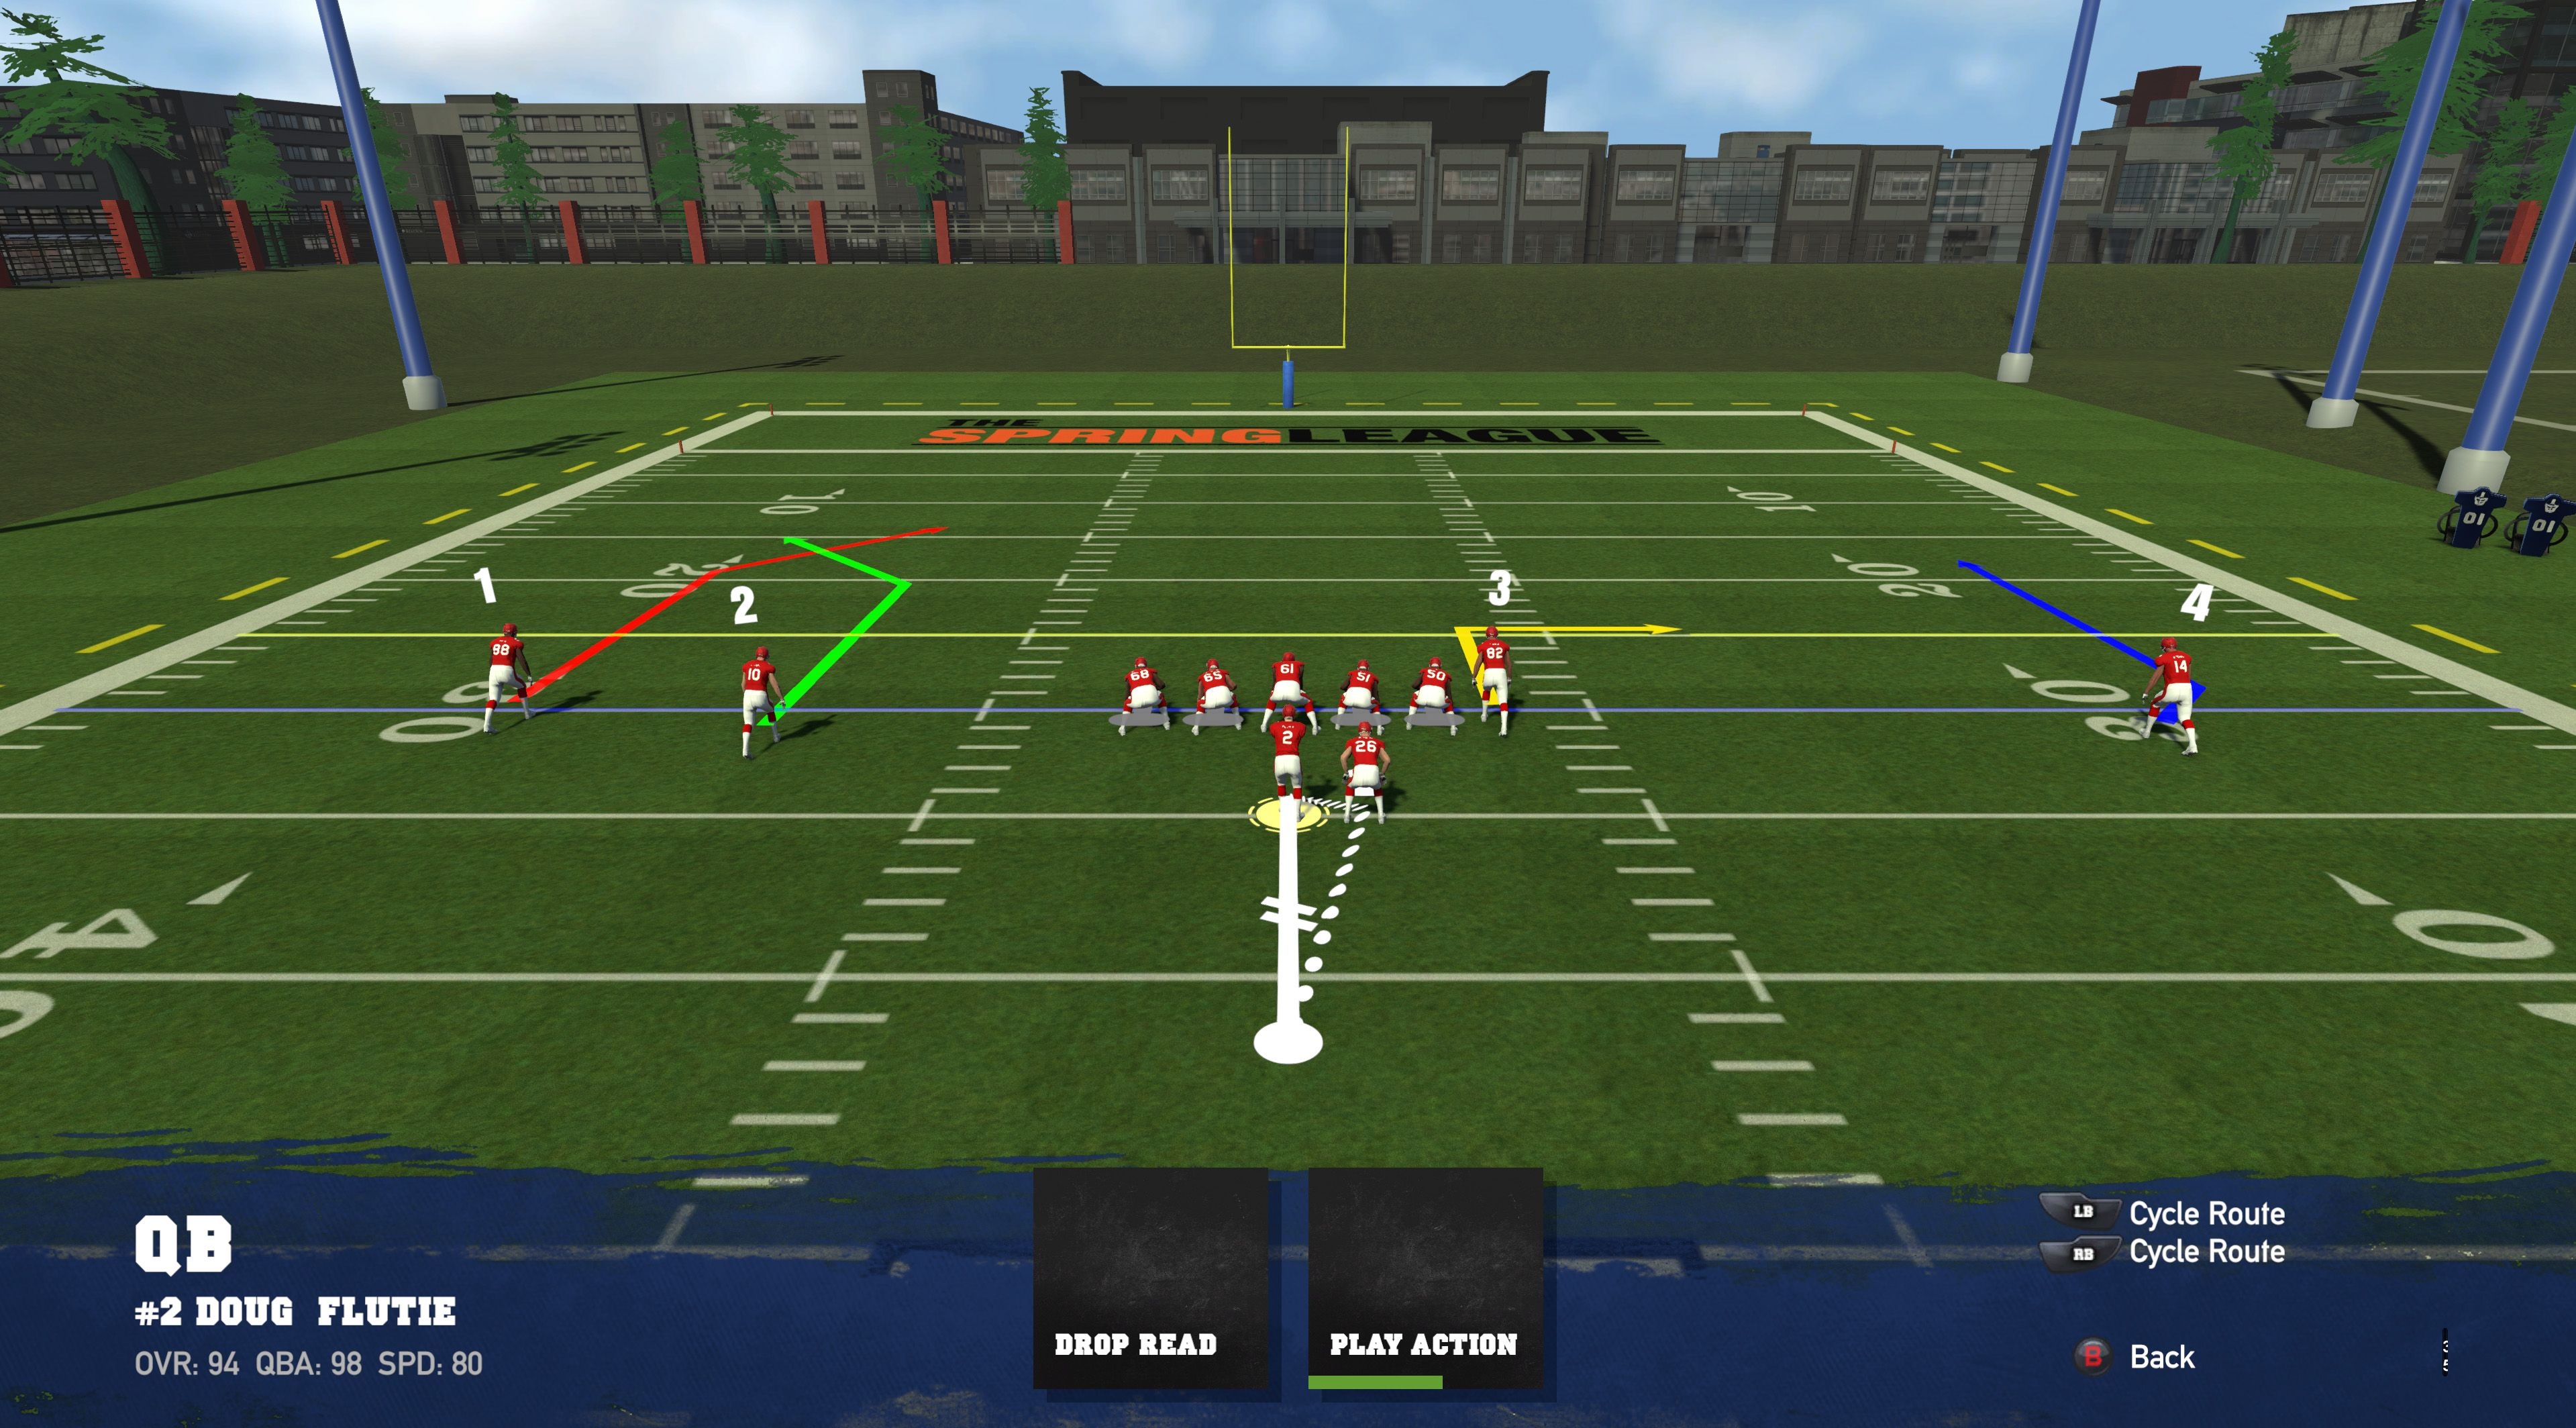 Doug Flutie's Maximum Football play Designer